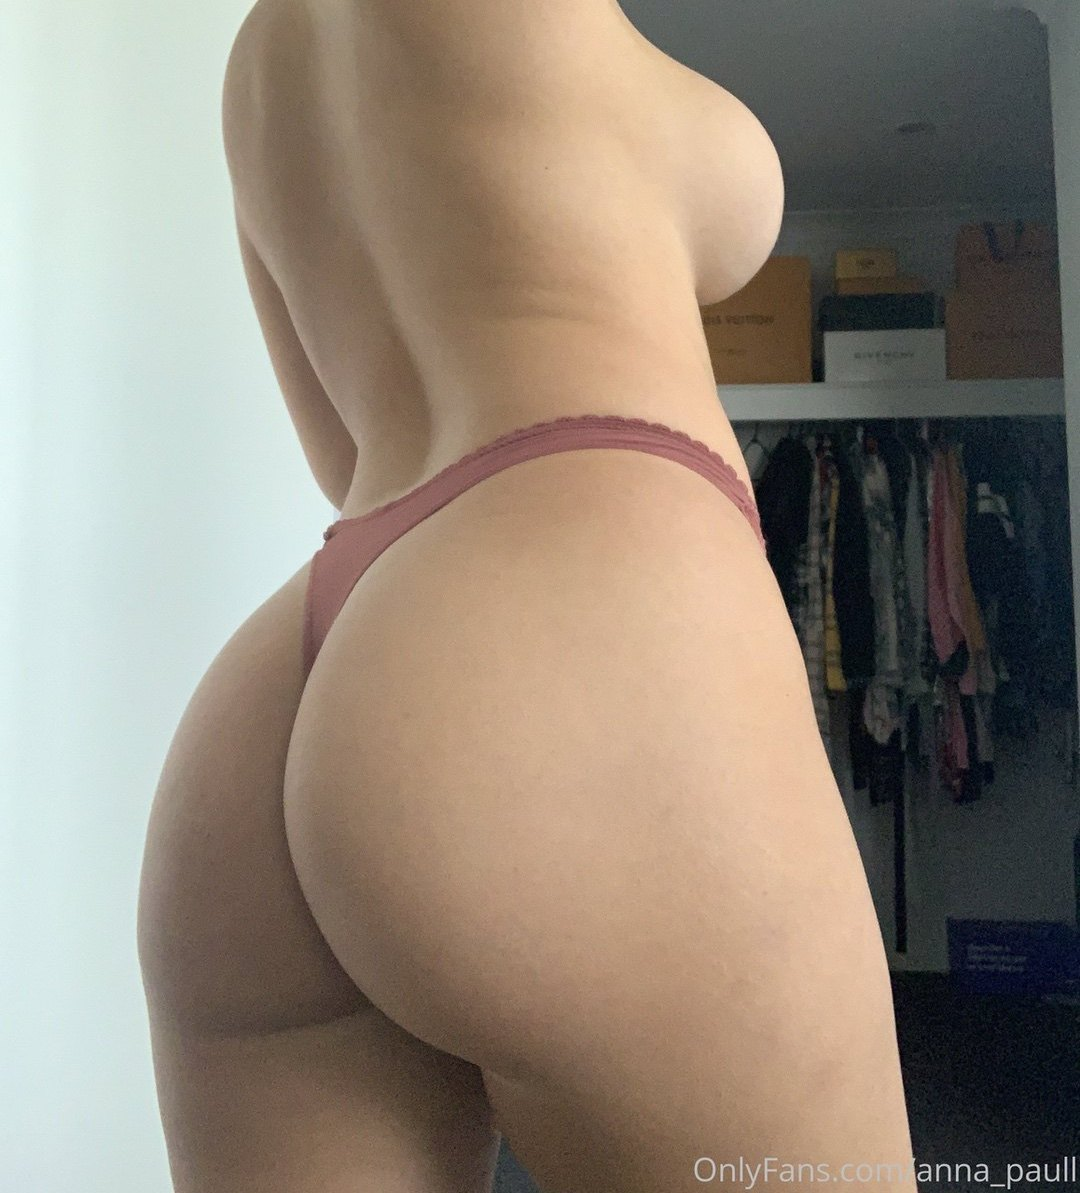 Anna Paul Anna Paull Onlyfans Nudes Leaks 0017